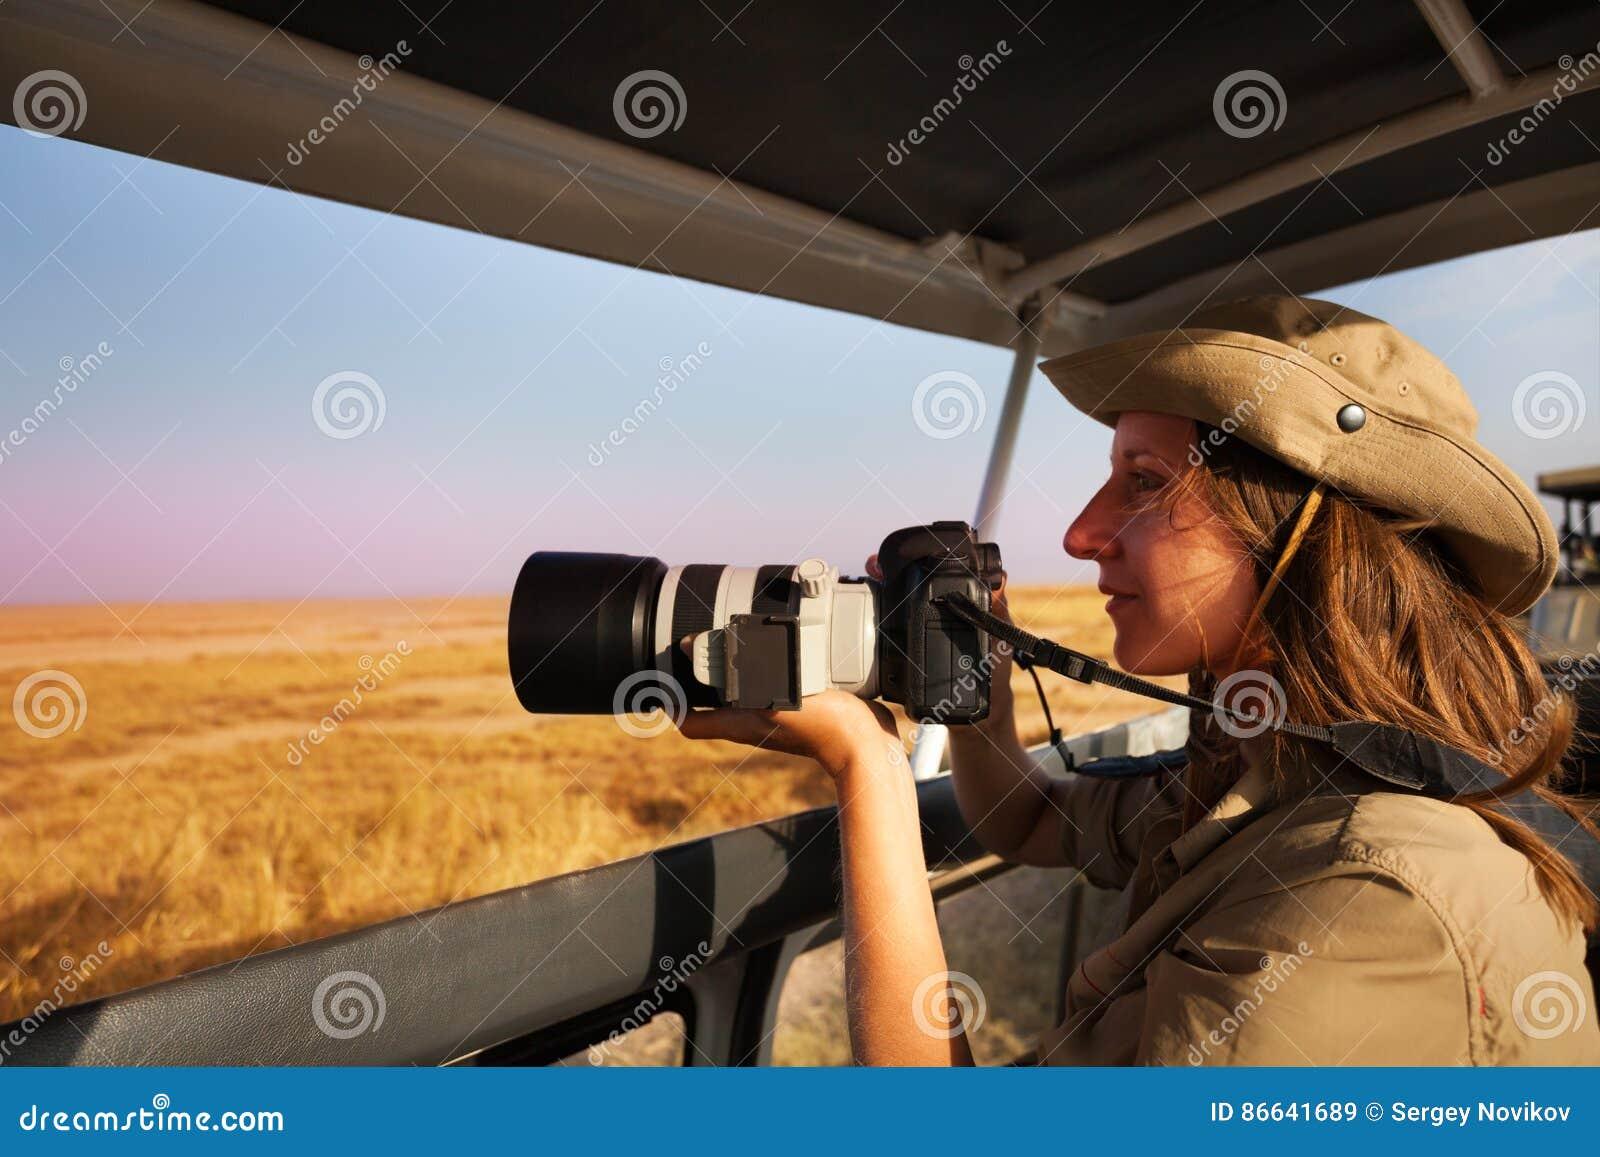 Woman Taking Photo Aboard Safari Jeep At Savannah Stock